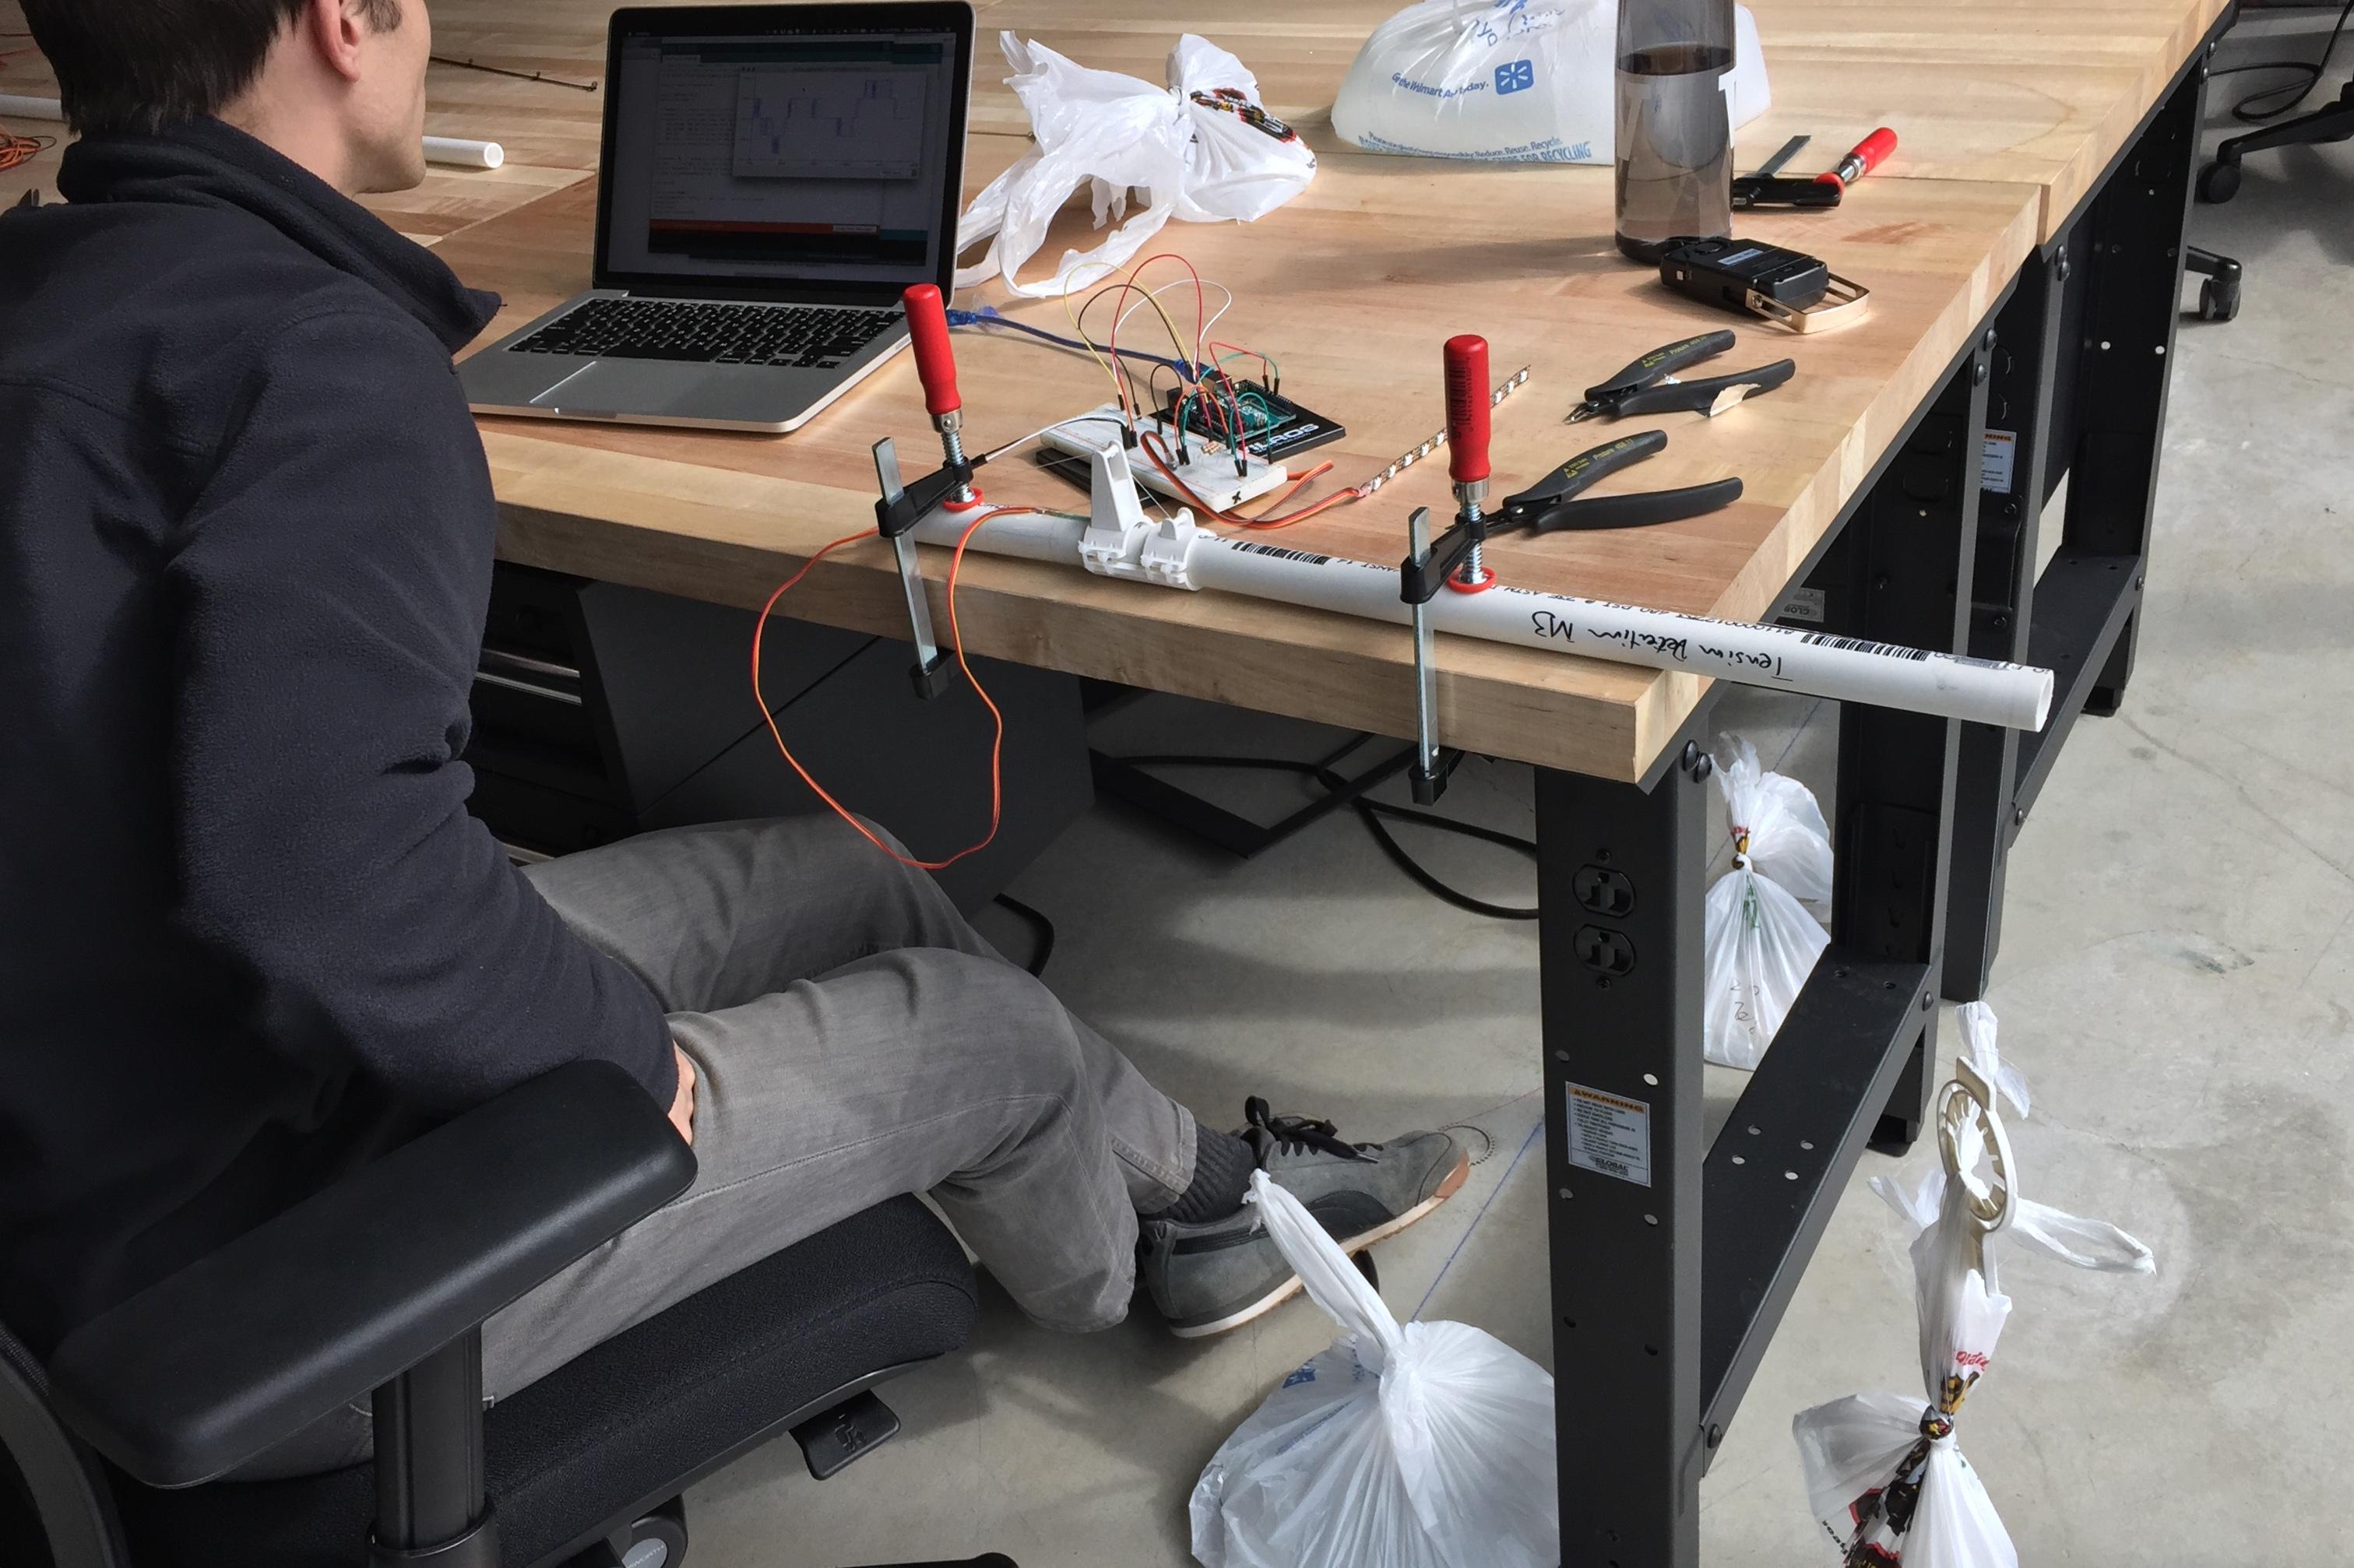 Testing sensors